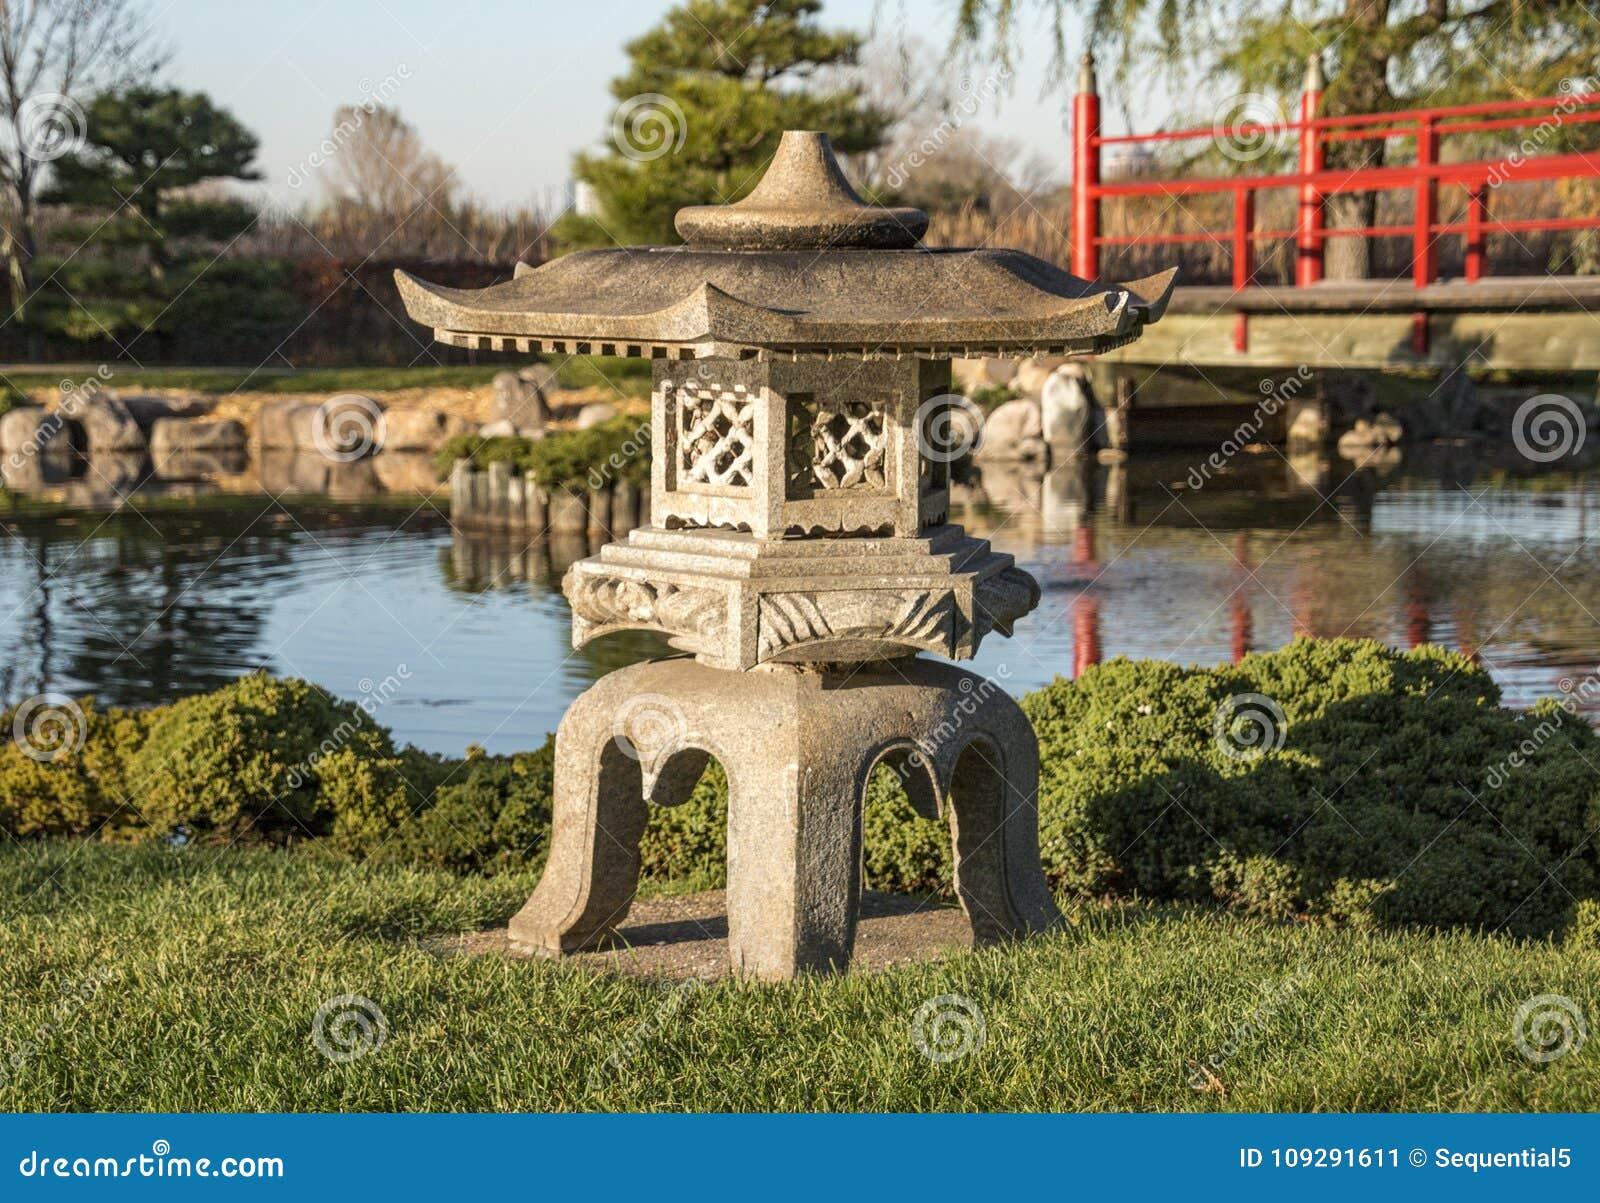 Japanese Pedestal Lantern Near A Pond Stock Image - Image of shrine ...